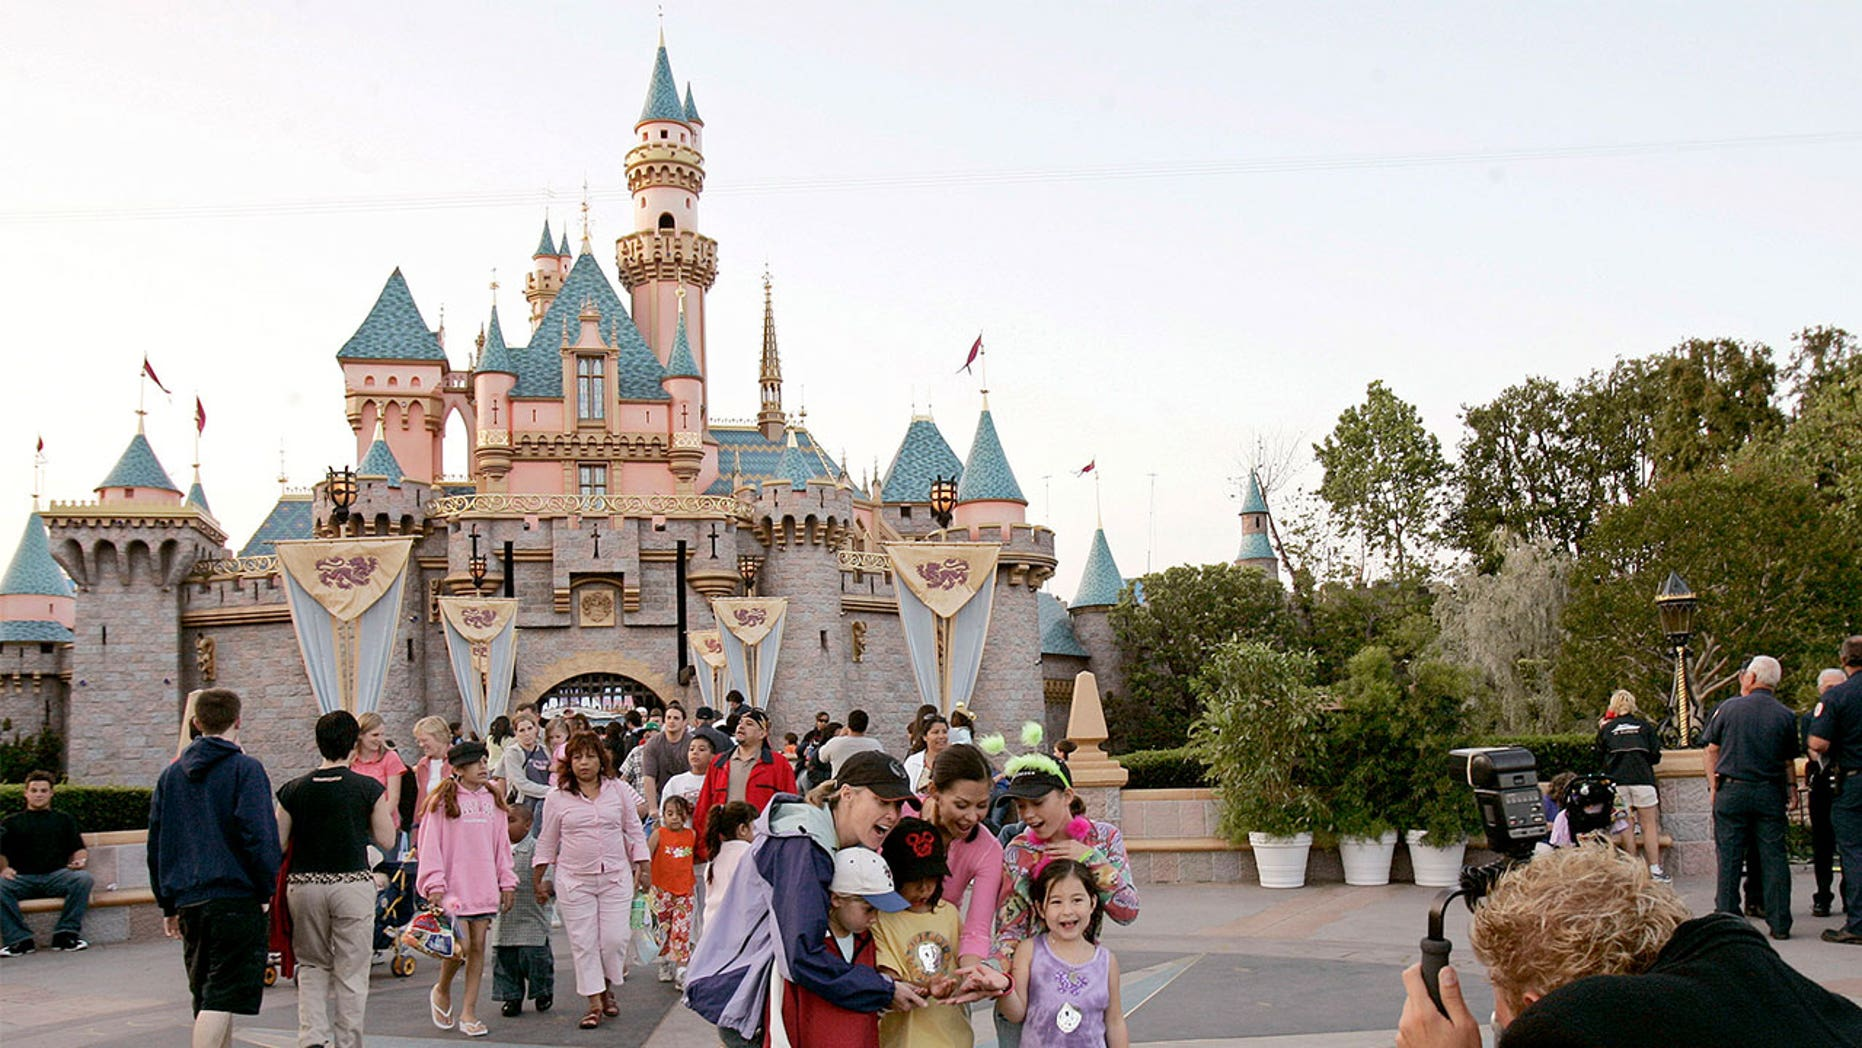 Disneyland park-goers got pooped on by an overhead flock of geese.